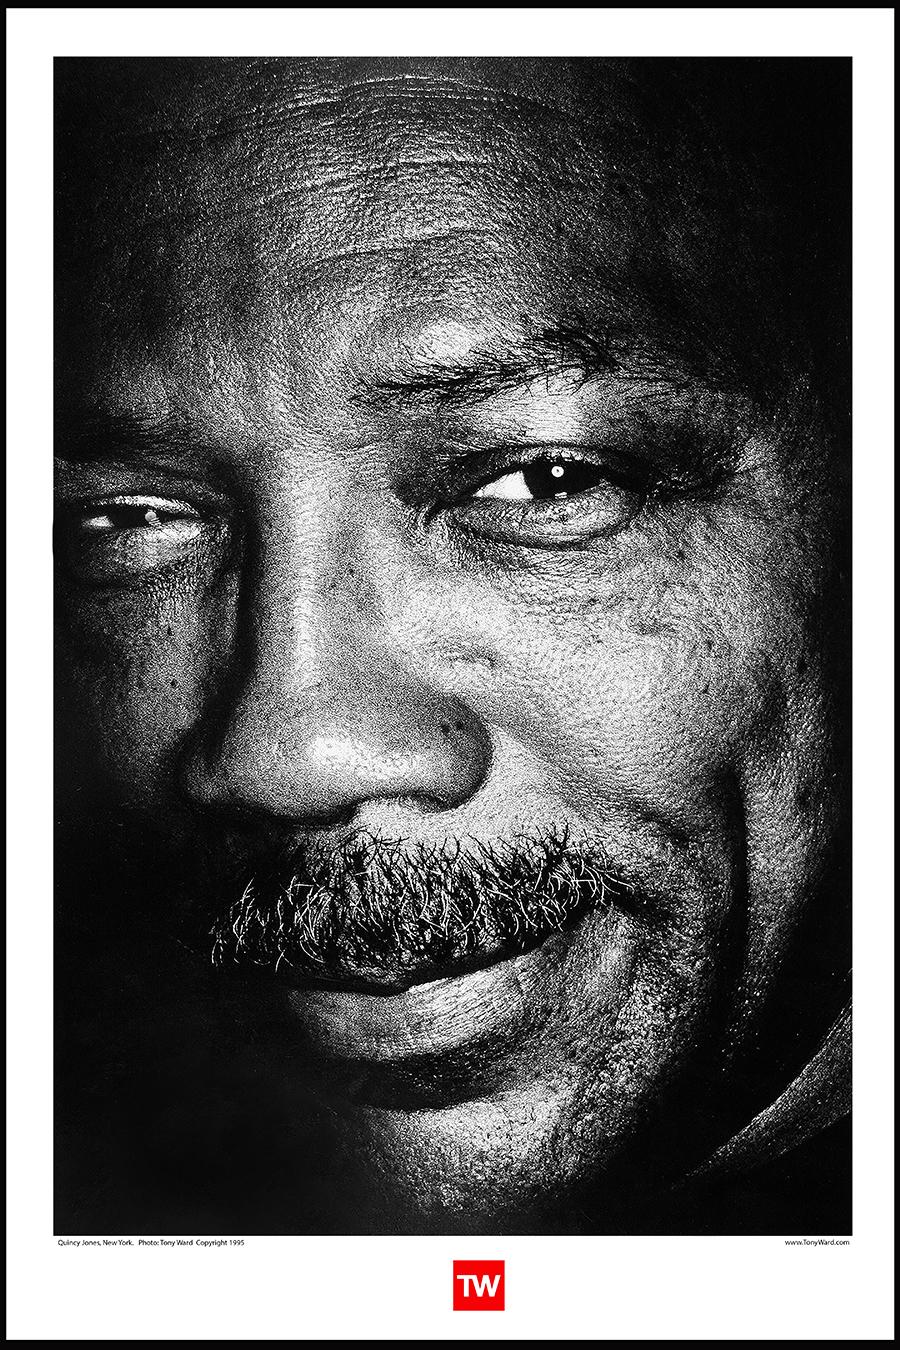 Tony_Ward_Photography_early_work_portraiture_portraits_Quincy_Jones_music_mogul